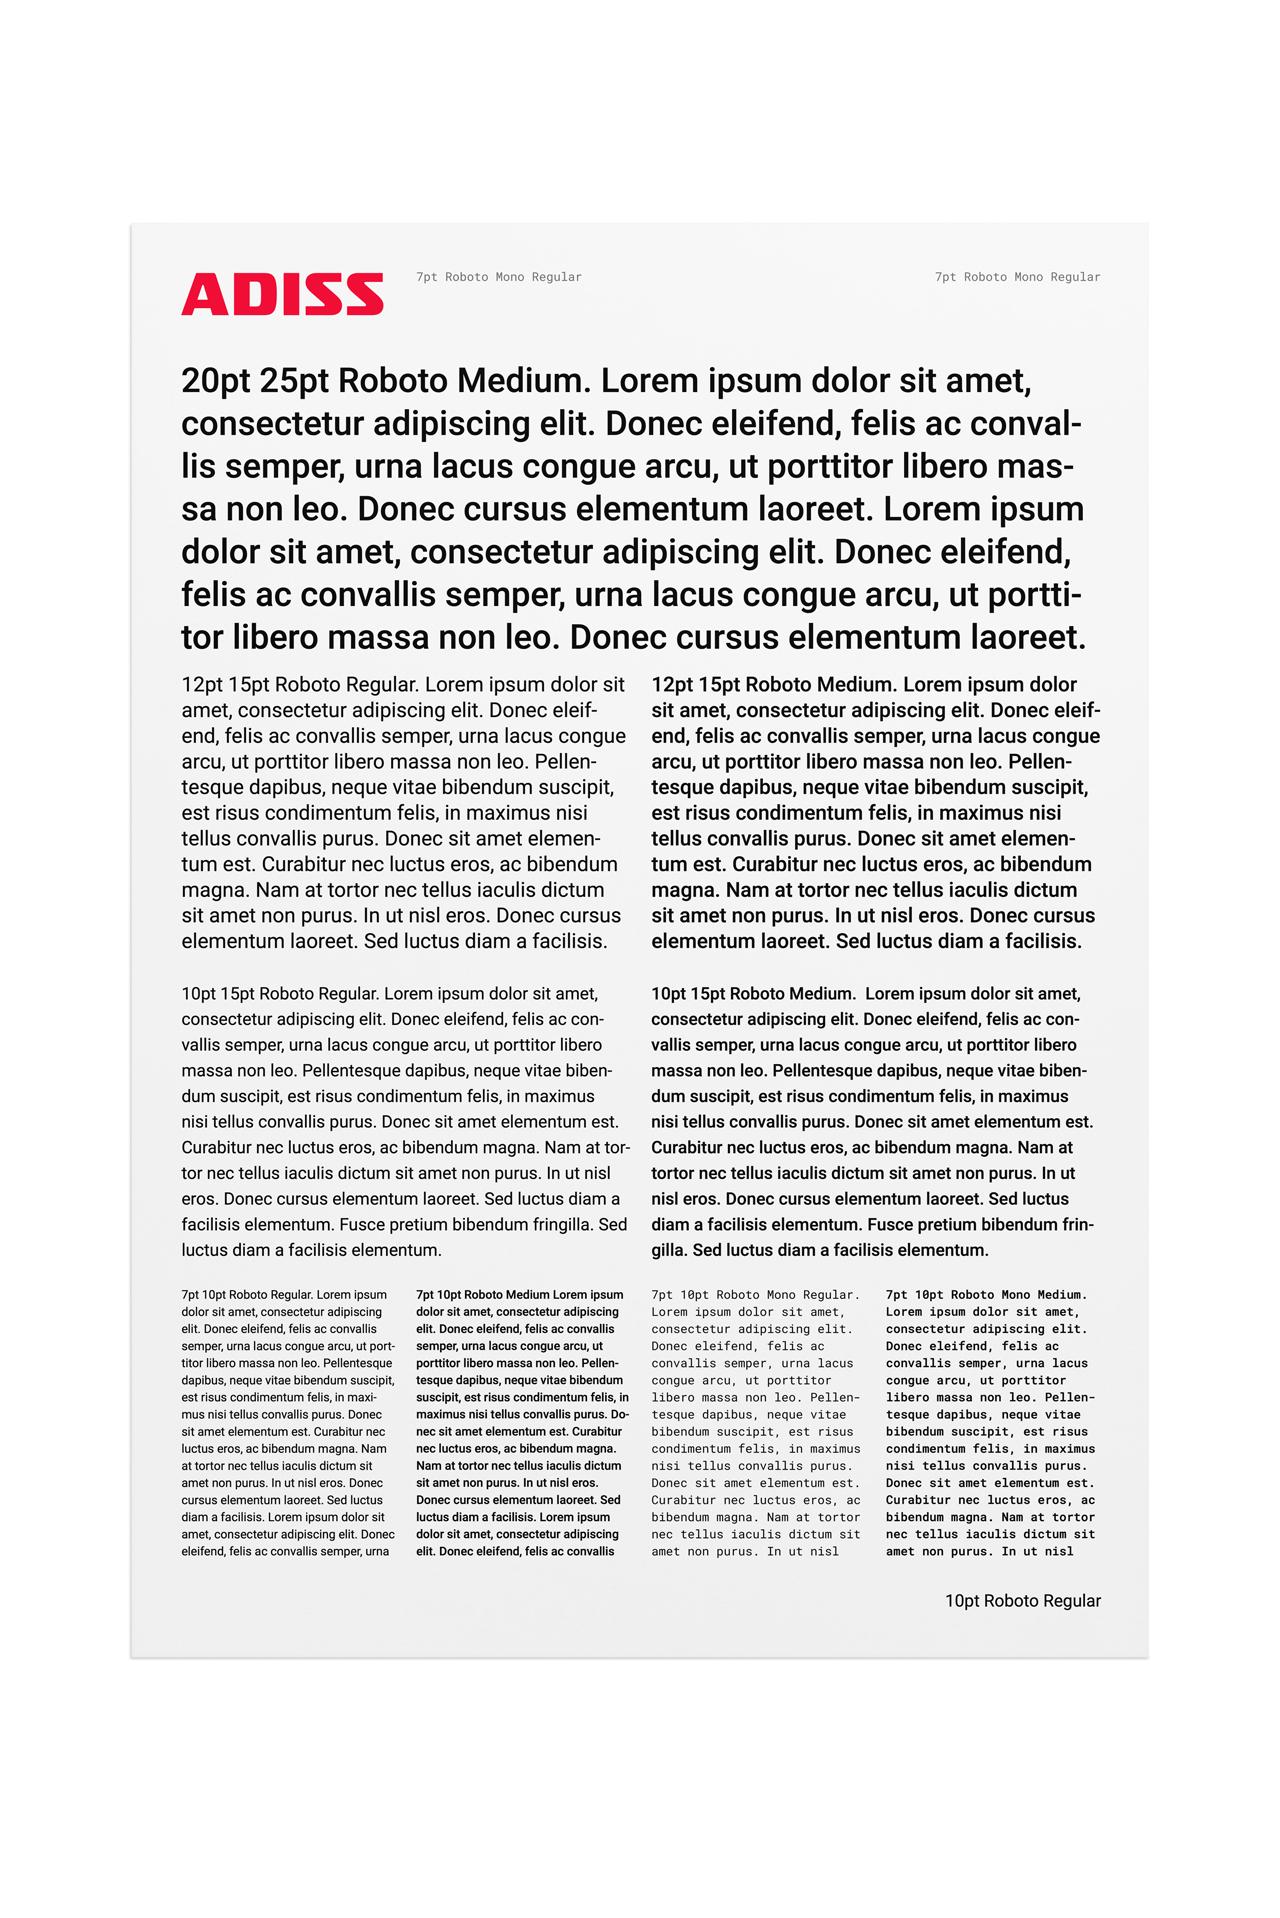 Adiss-letterhead-02.jpg